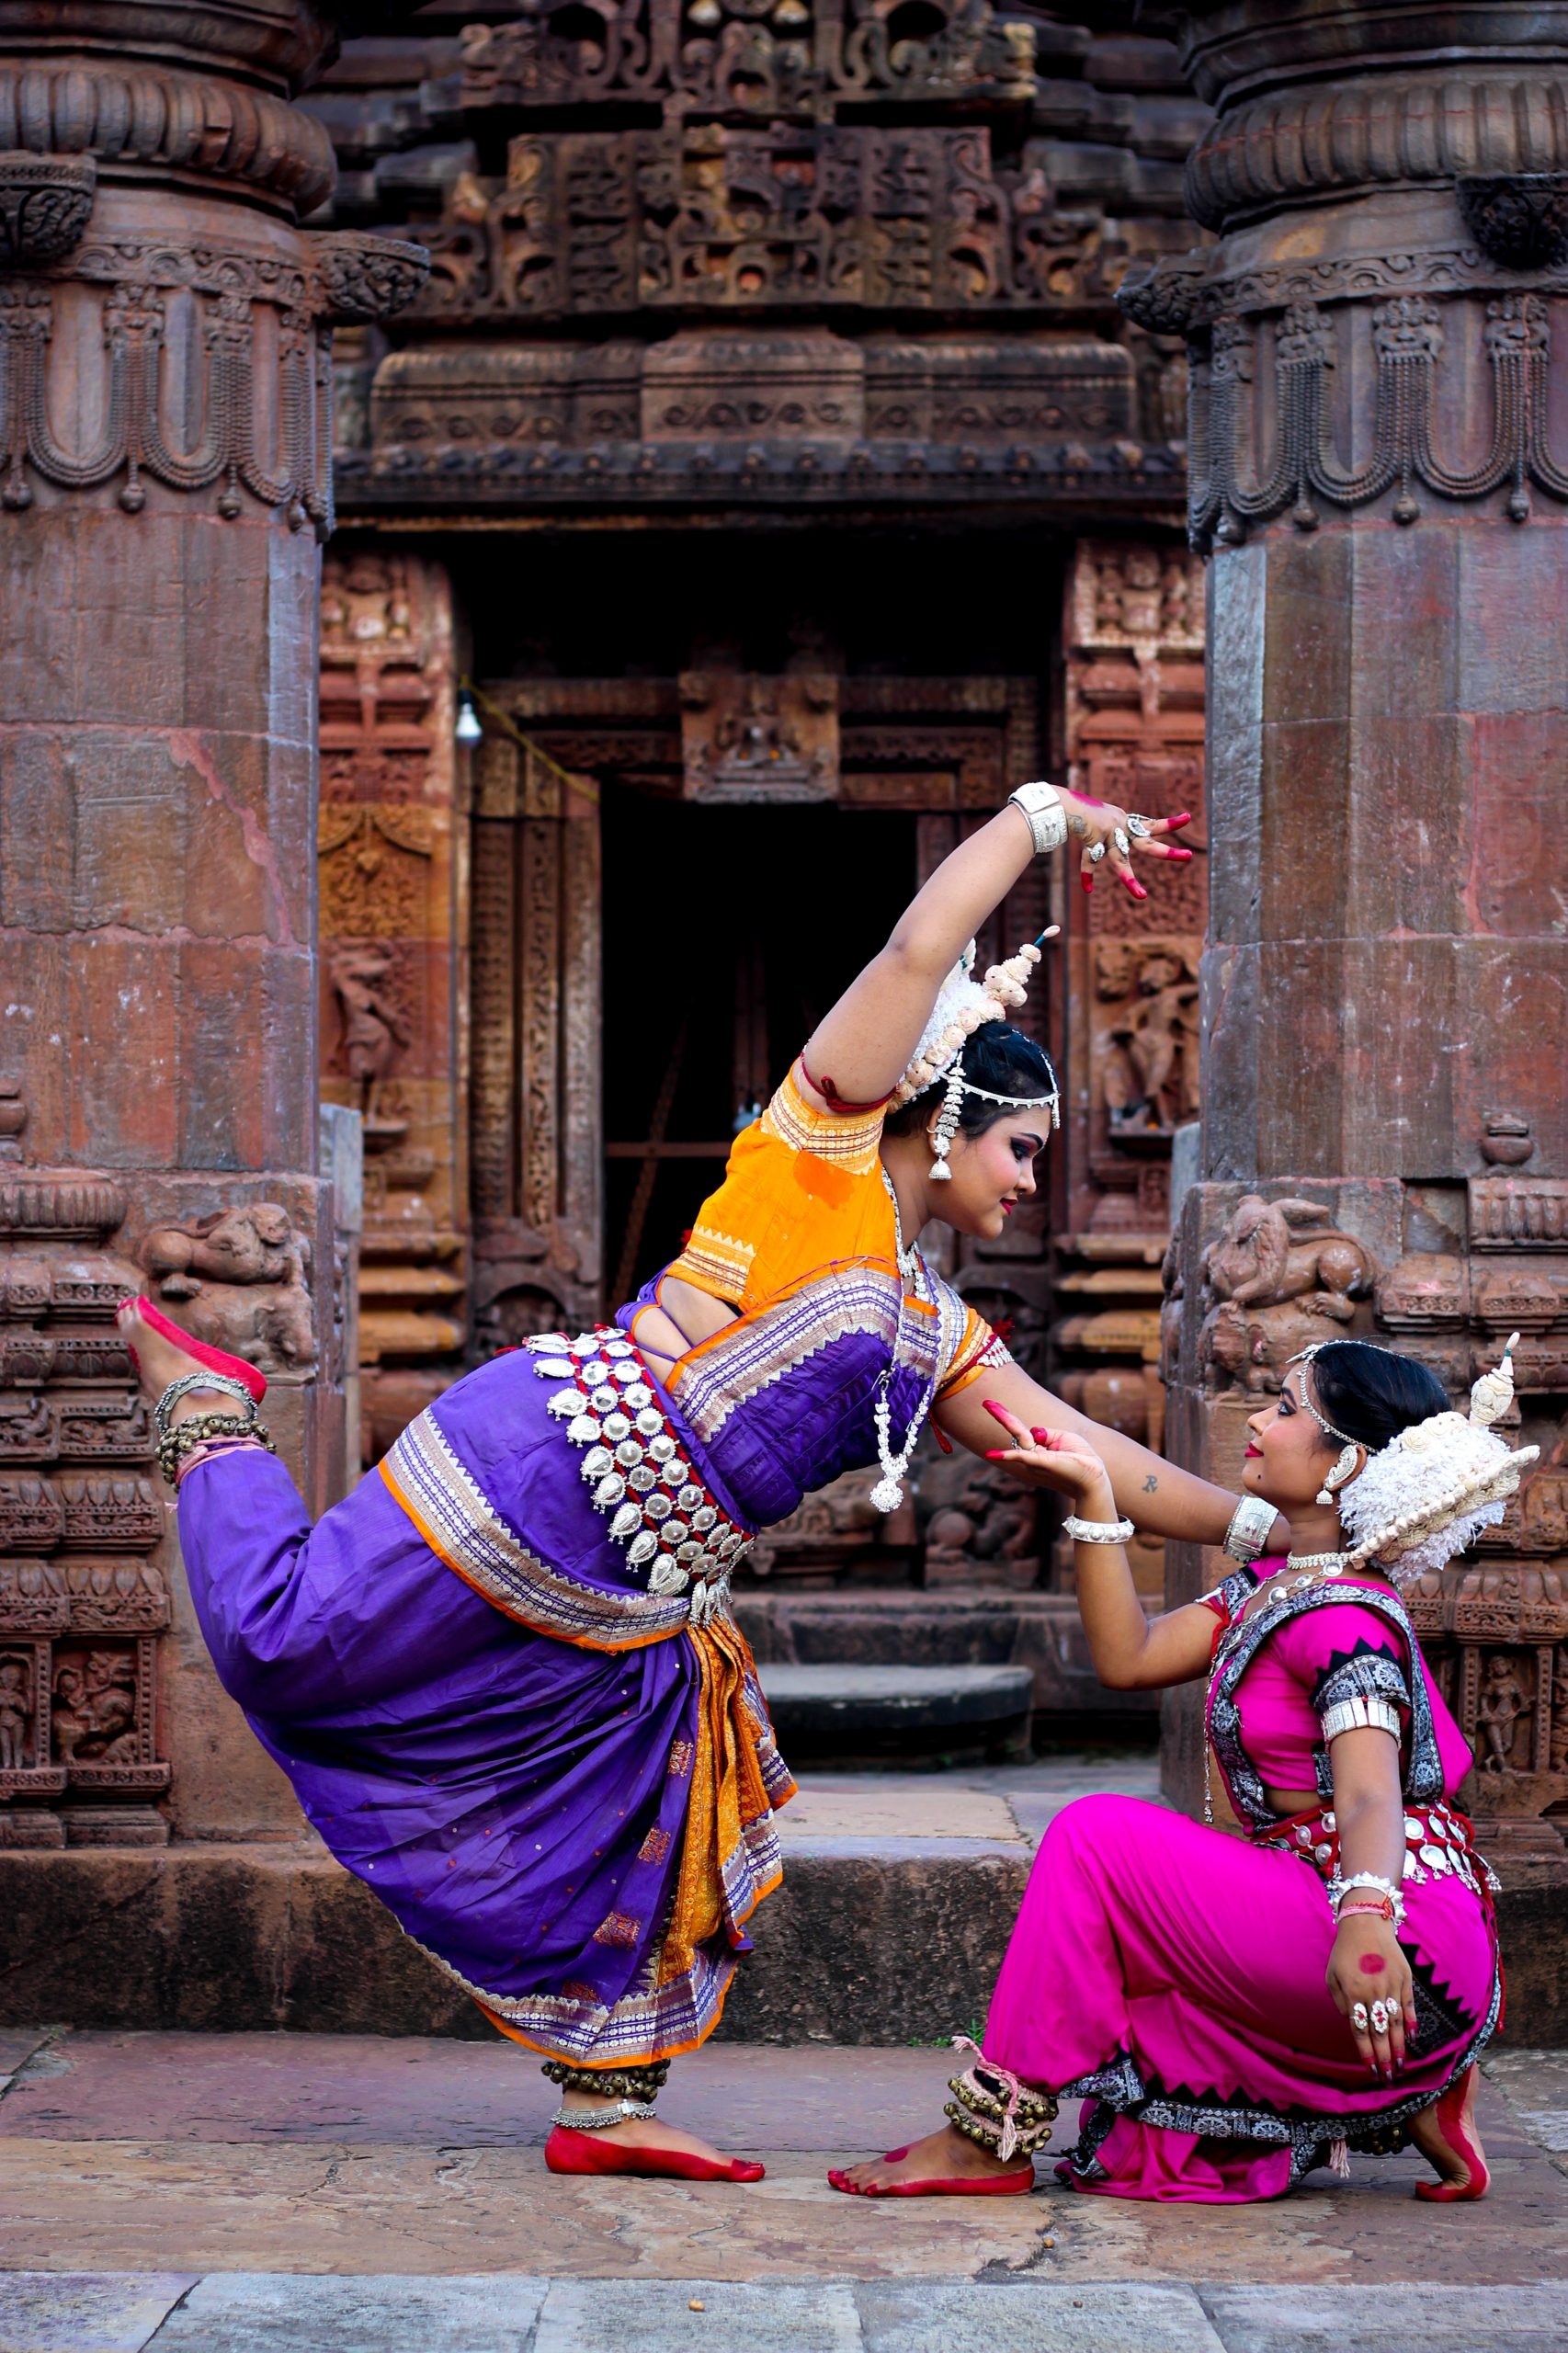 odishi dancers at temple